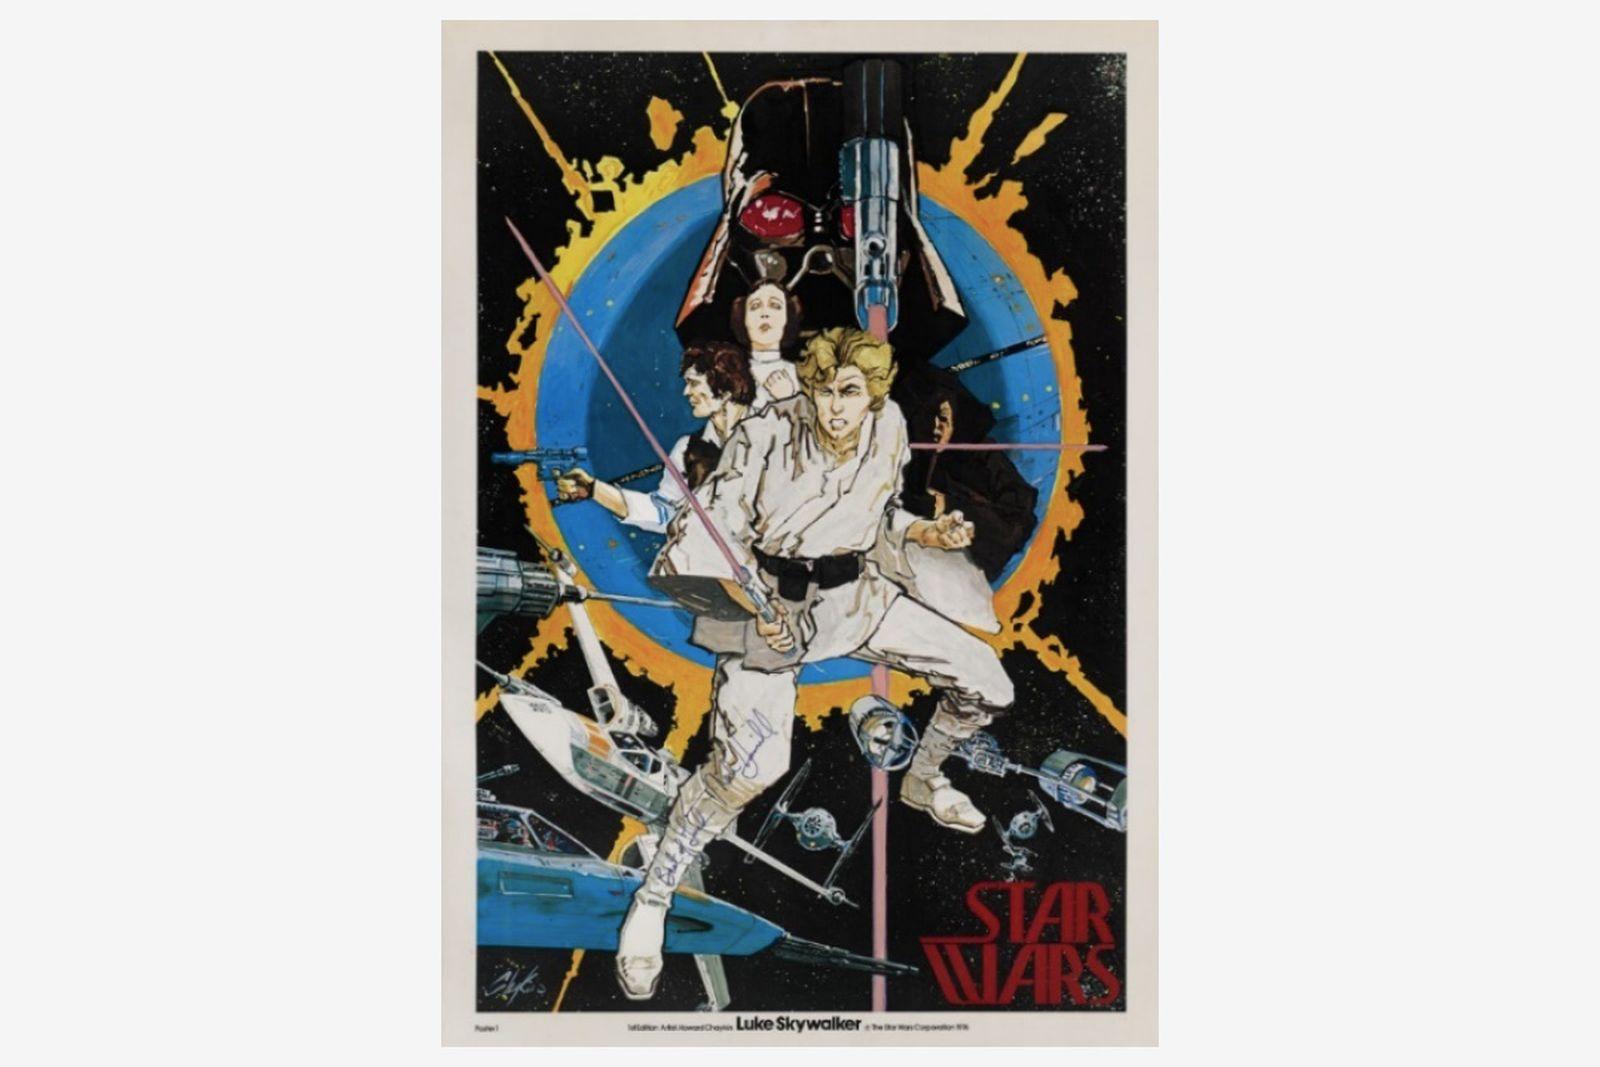 'Star Wars' poster, Howard Chaykin, US, 1976, signed by Mark Hamill